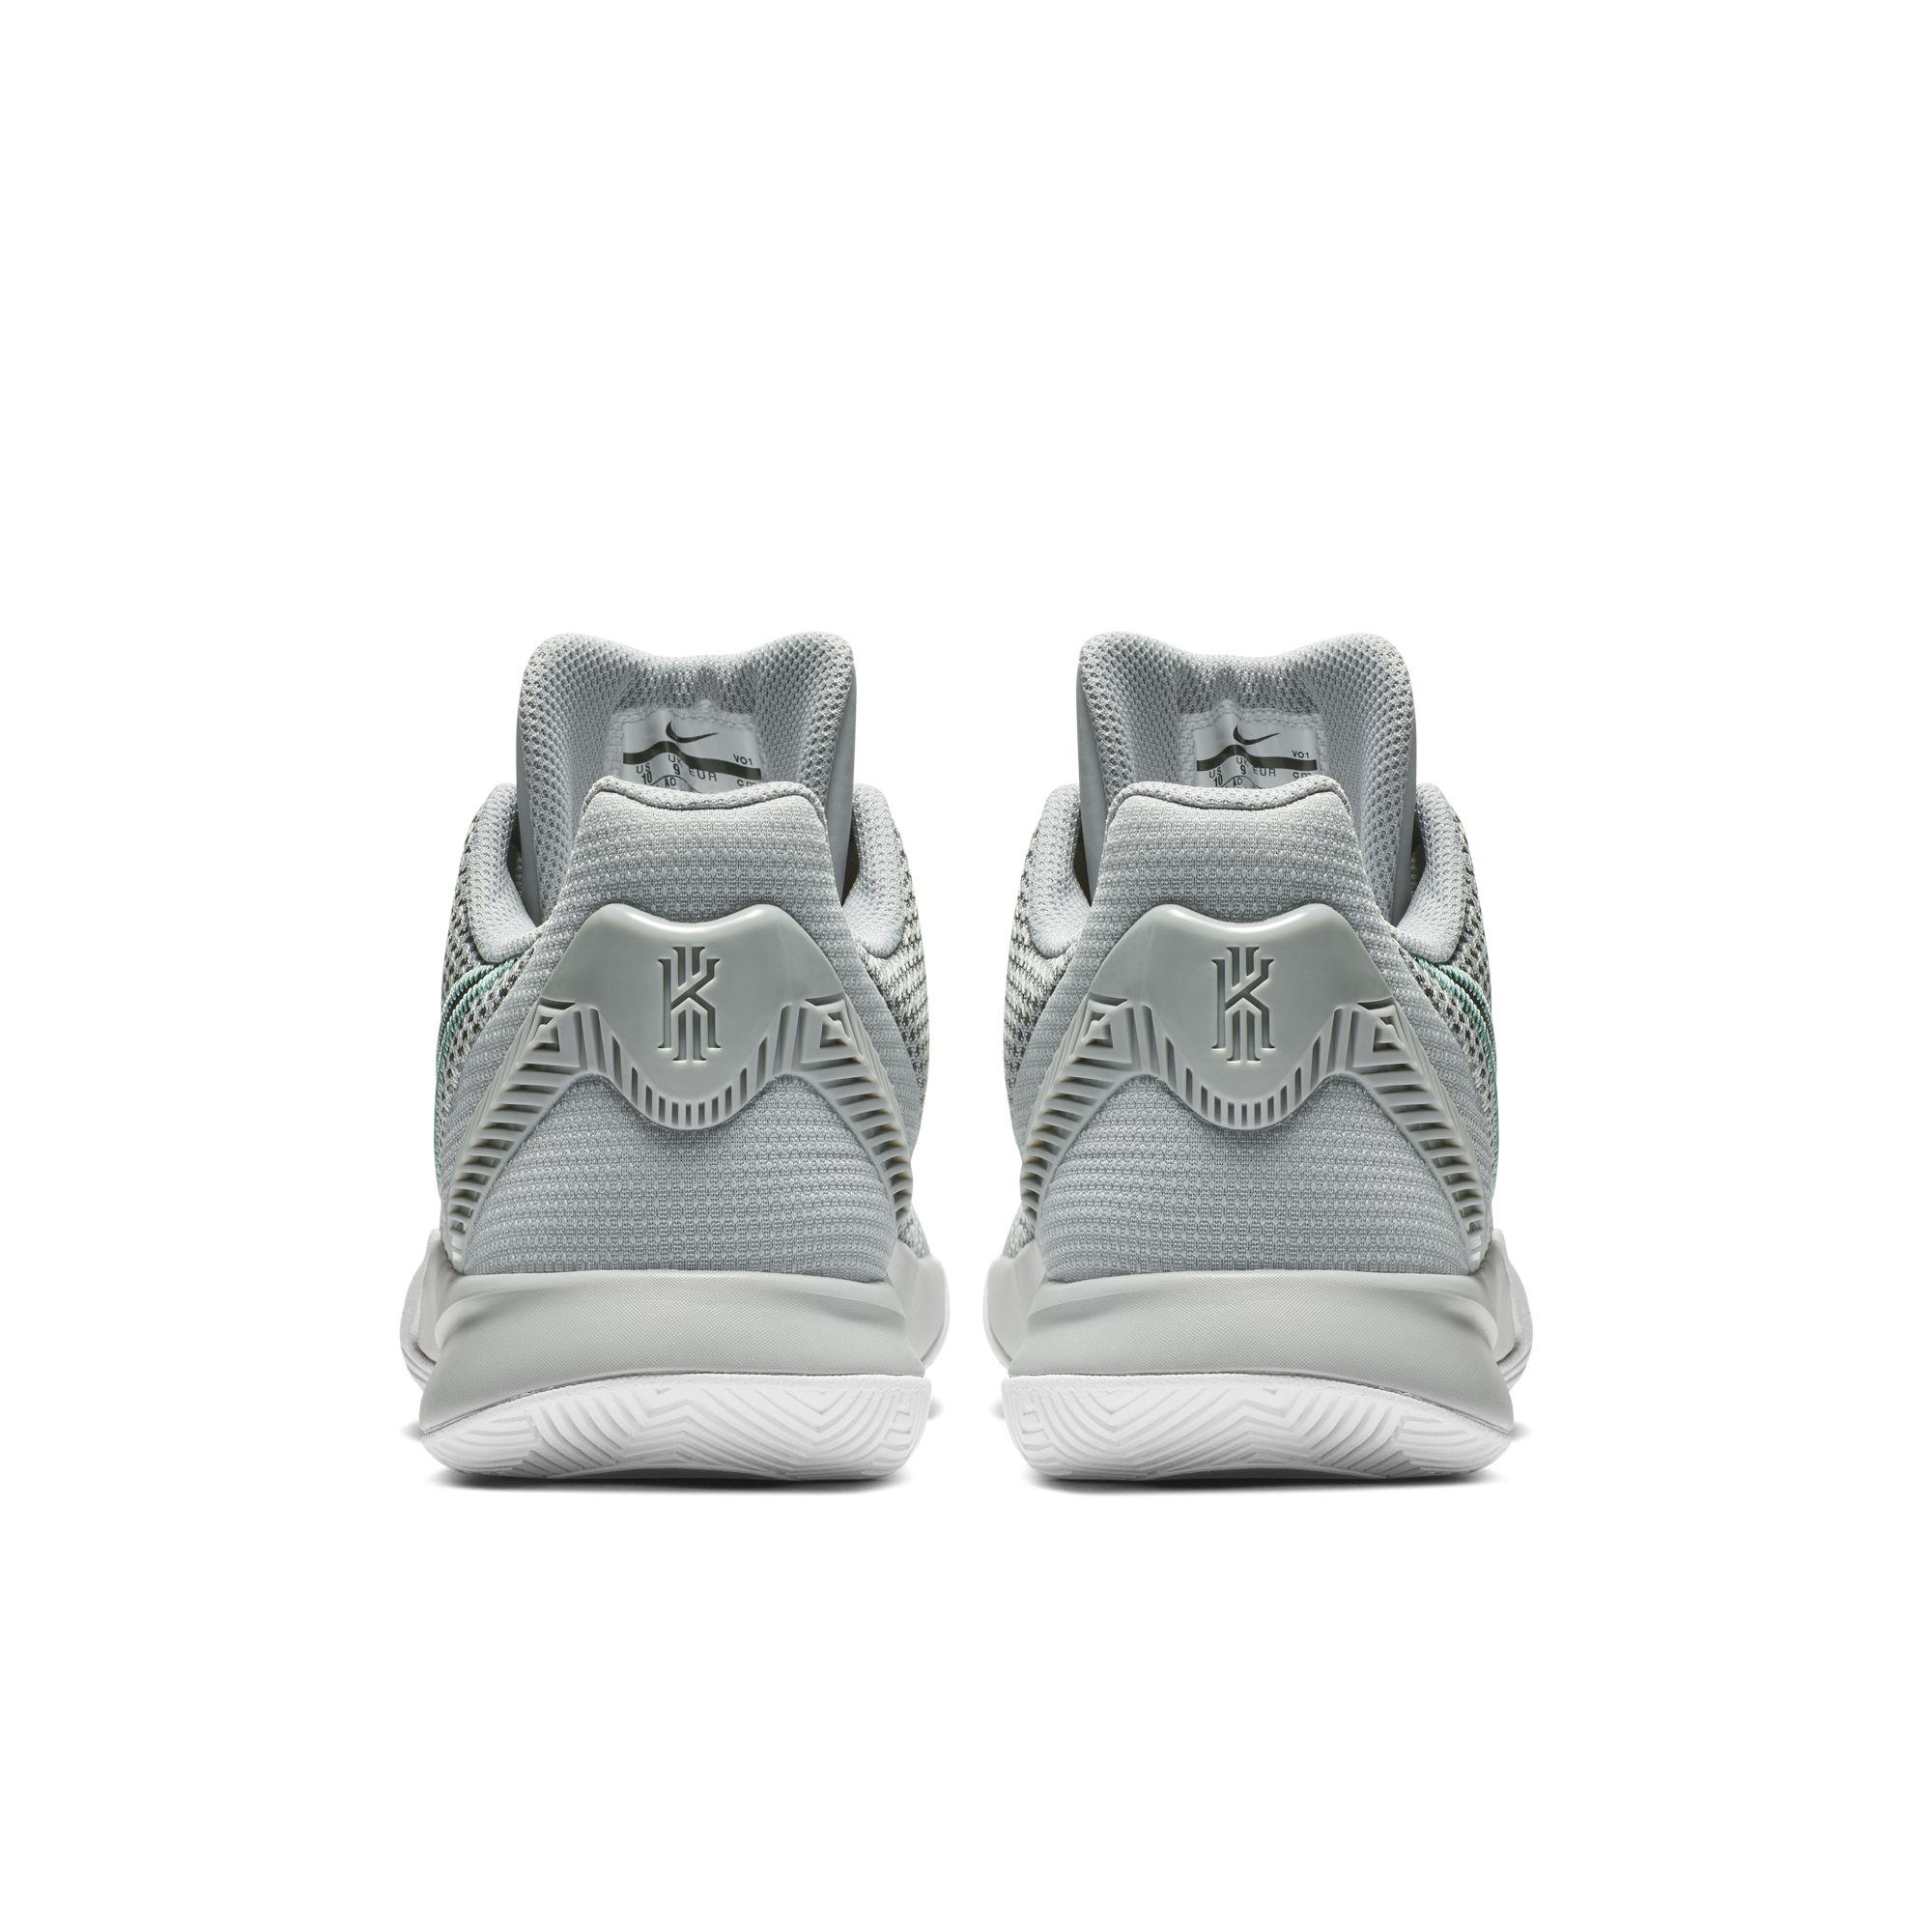 Nike Kyrie Flytrap 2 'Grey:Teal' 4